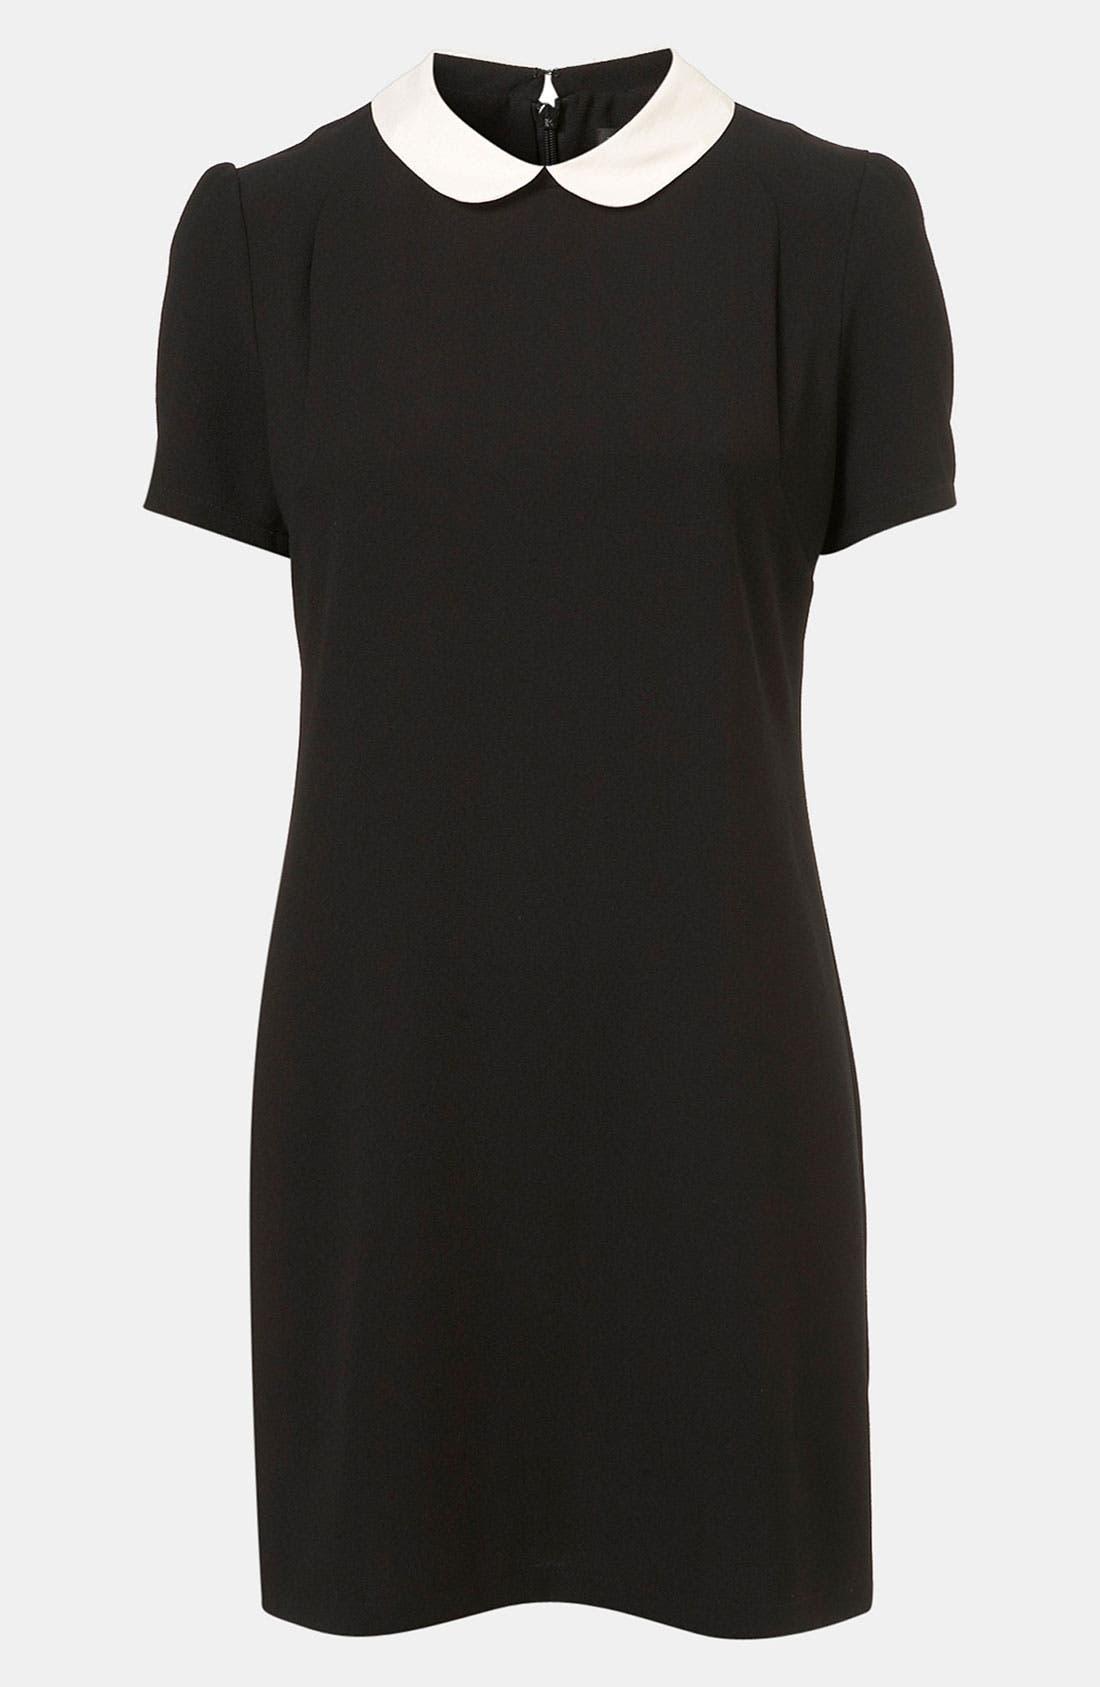 Alternate Image 1 Selected - Topshop Contrast Collar Shift Dress